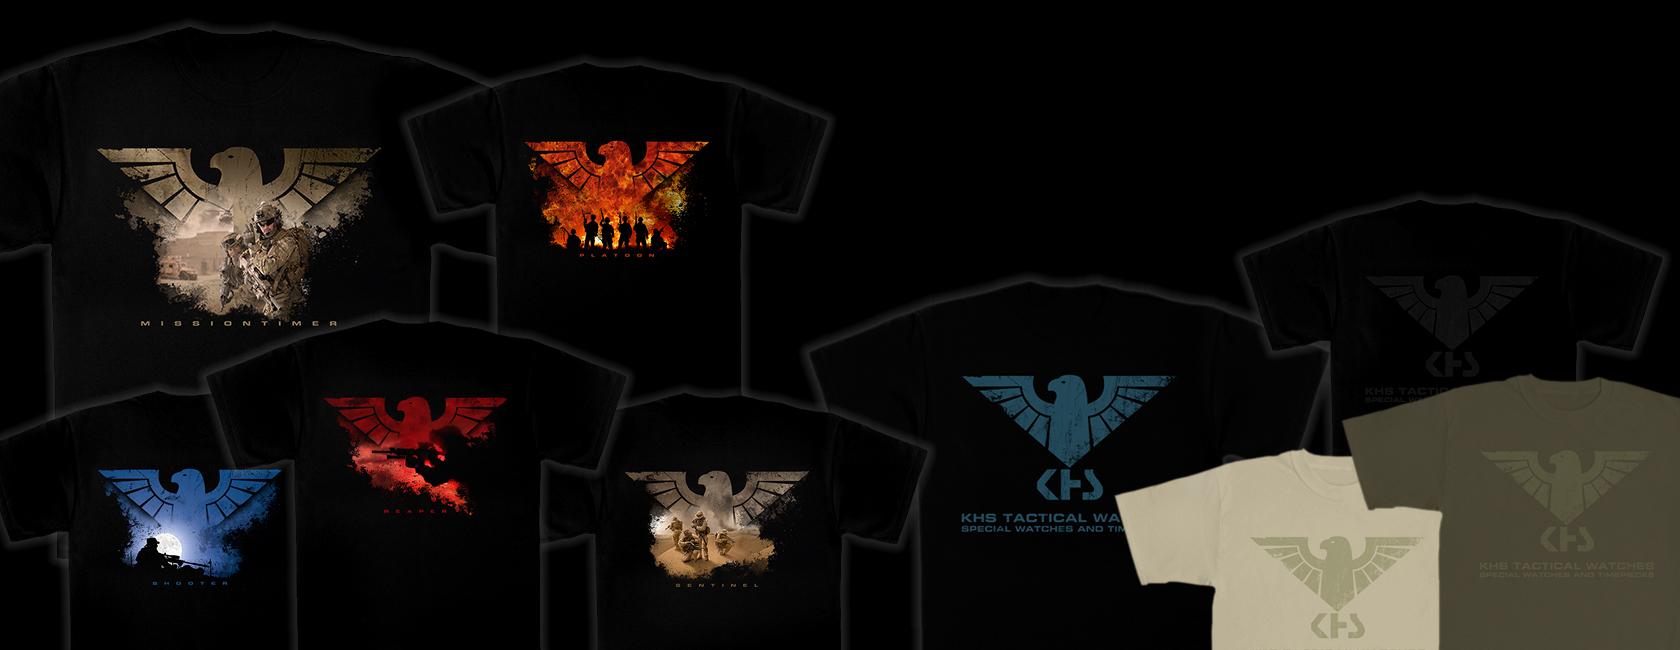 KHS T-Shirts